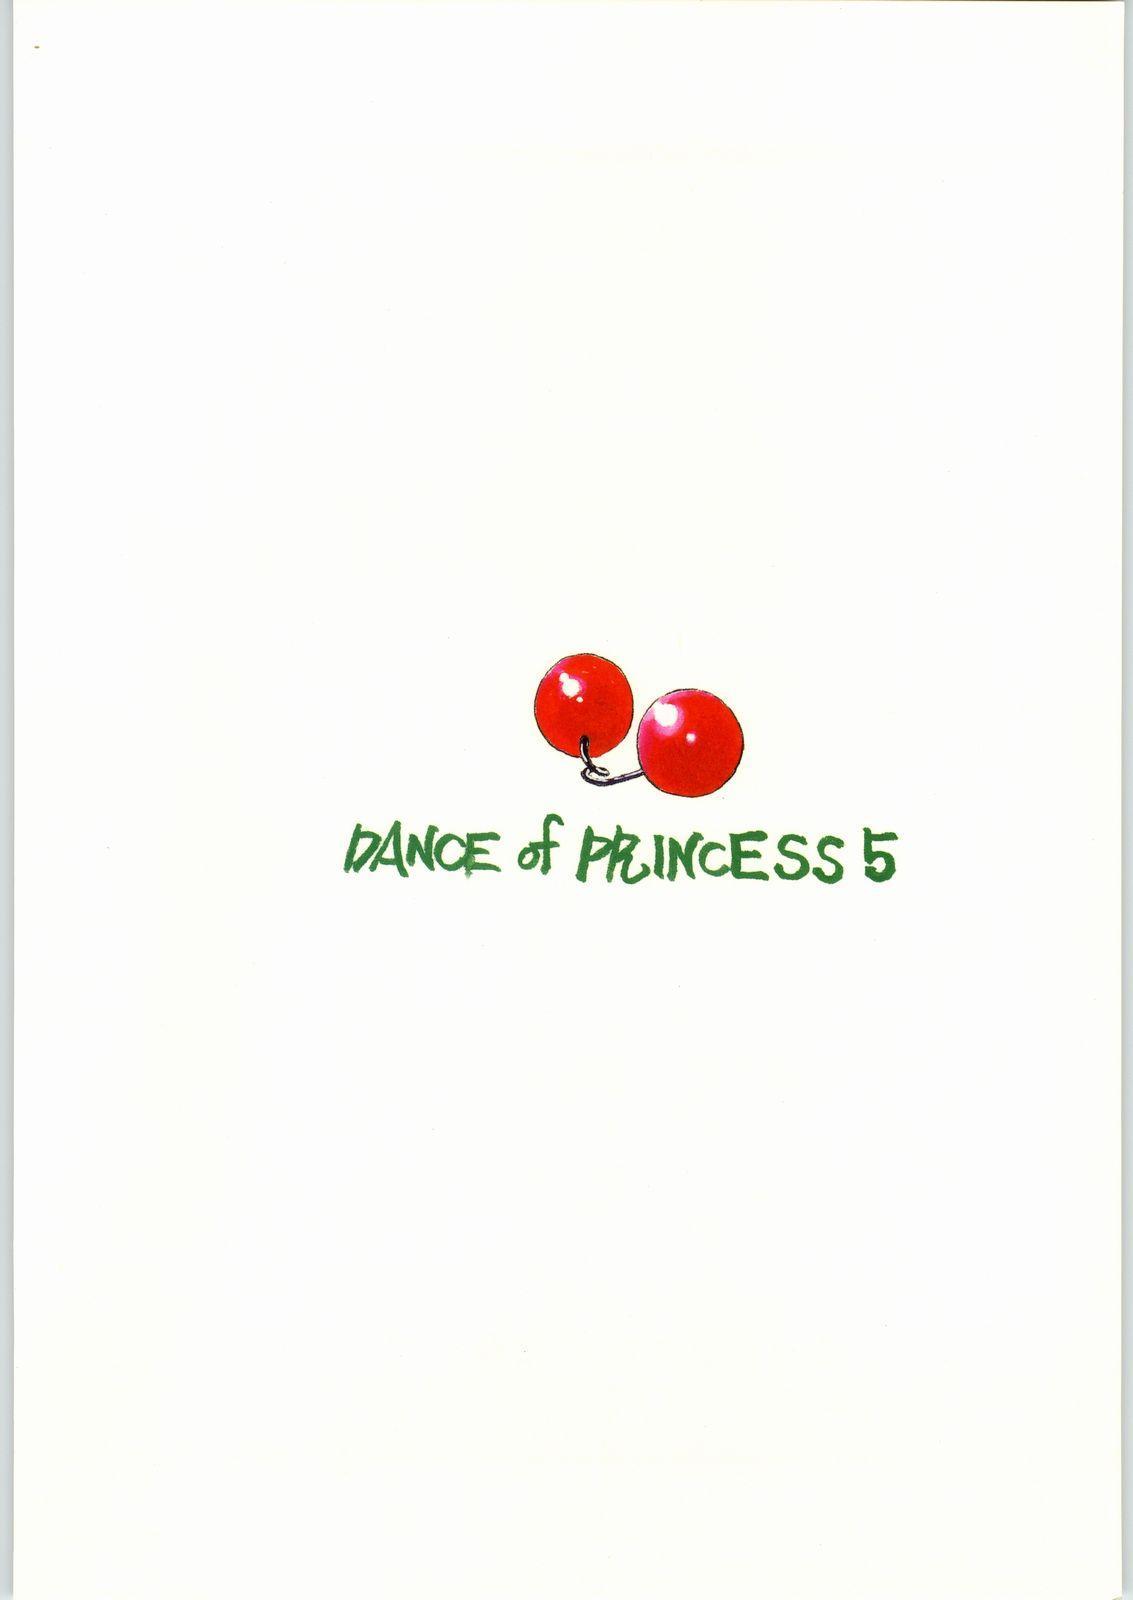 DANCE of PRINCESS 5 49